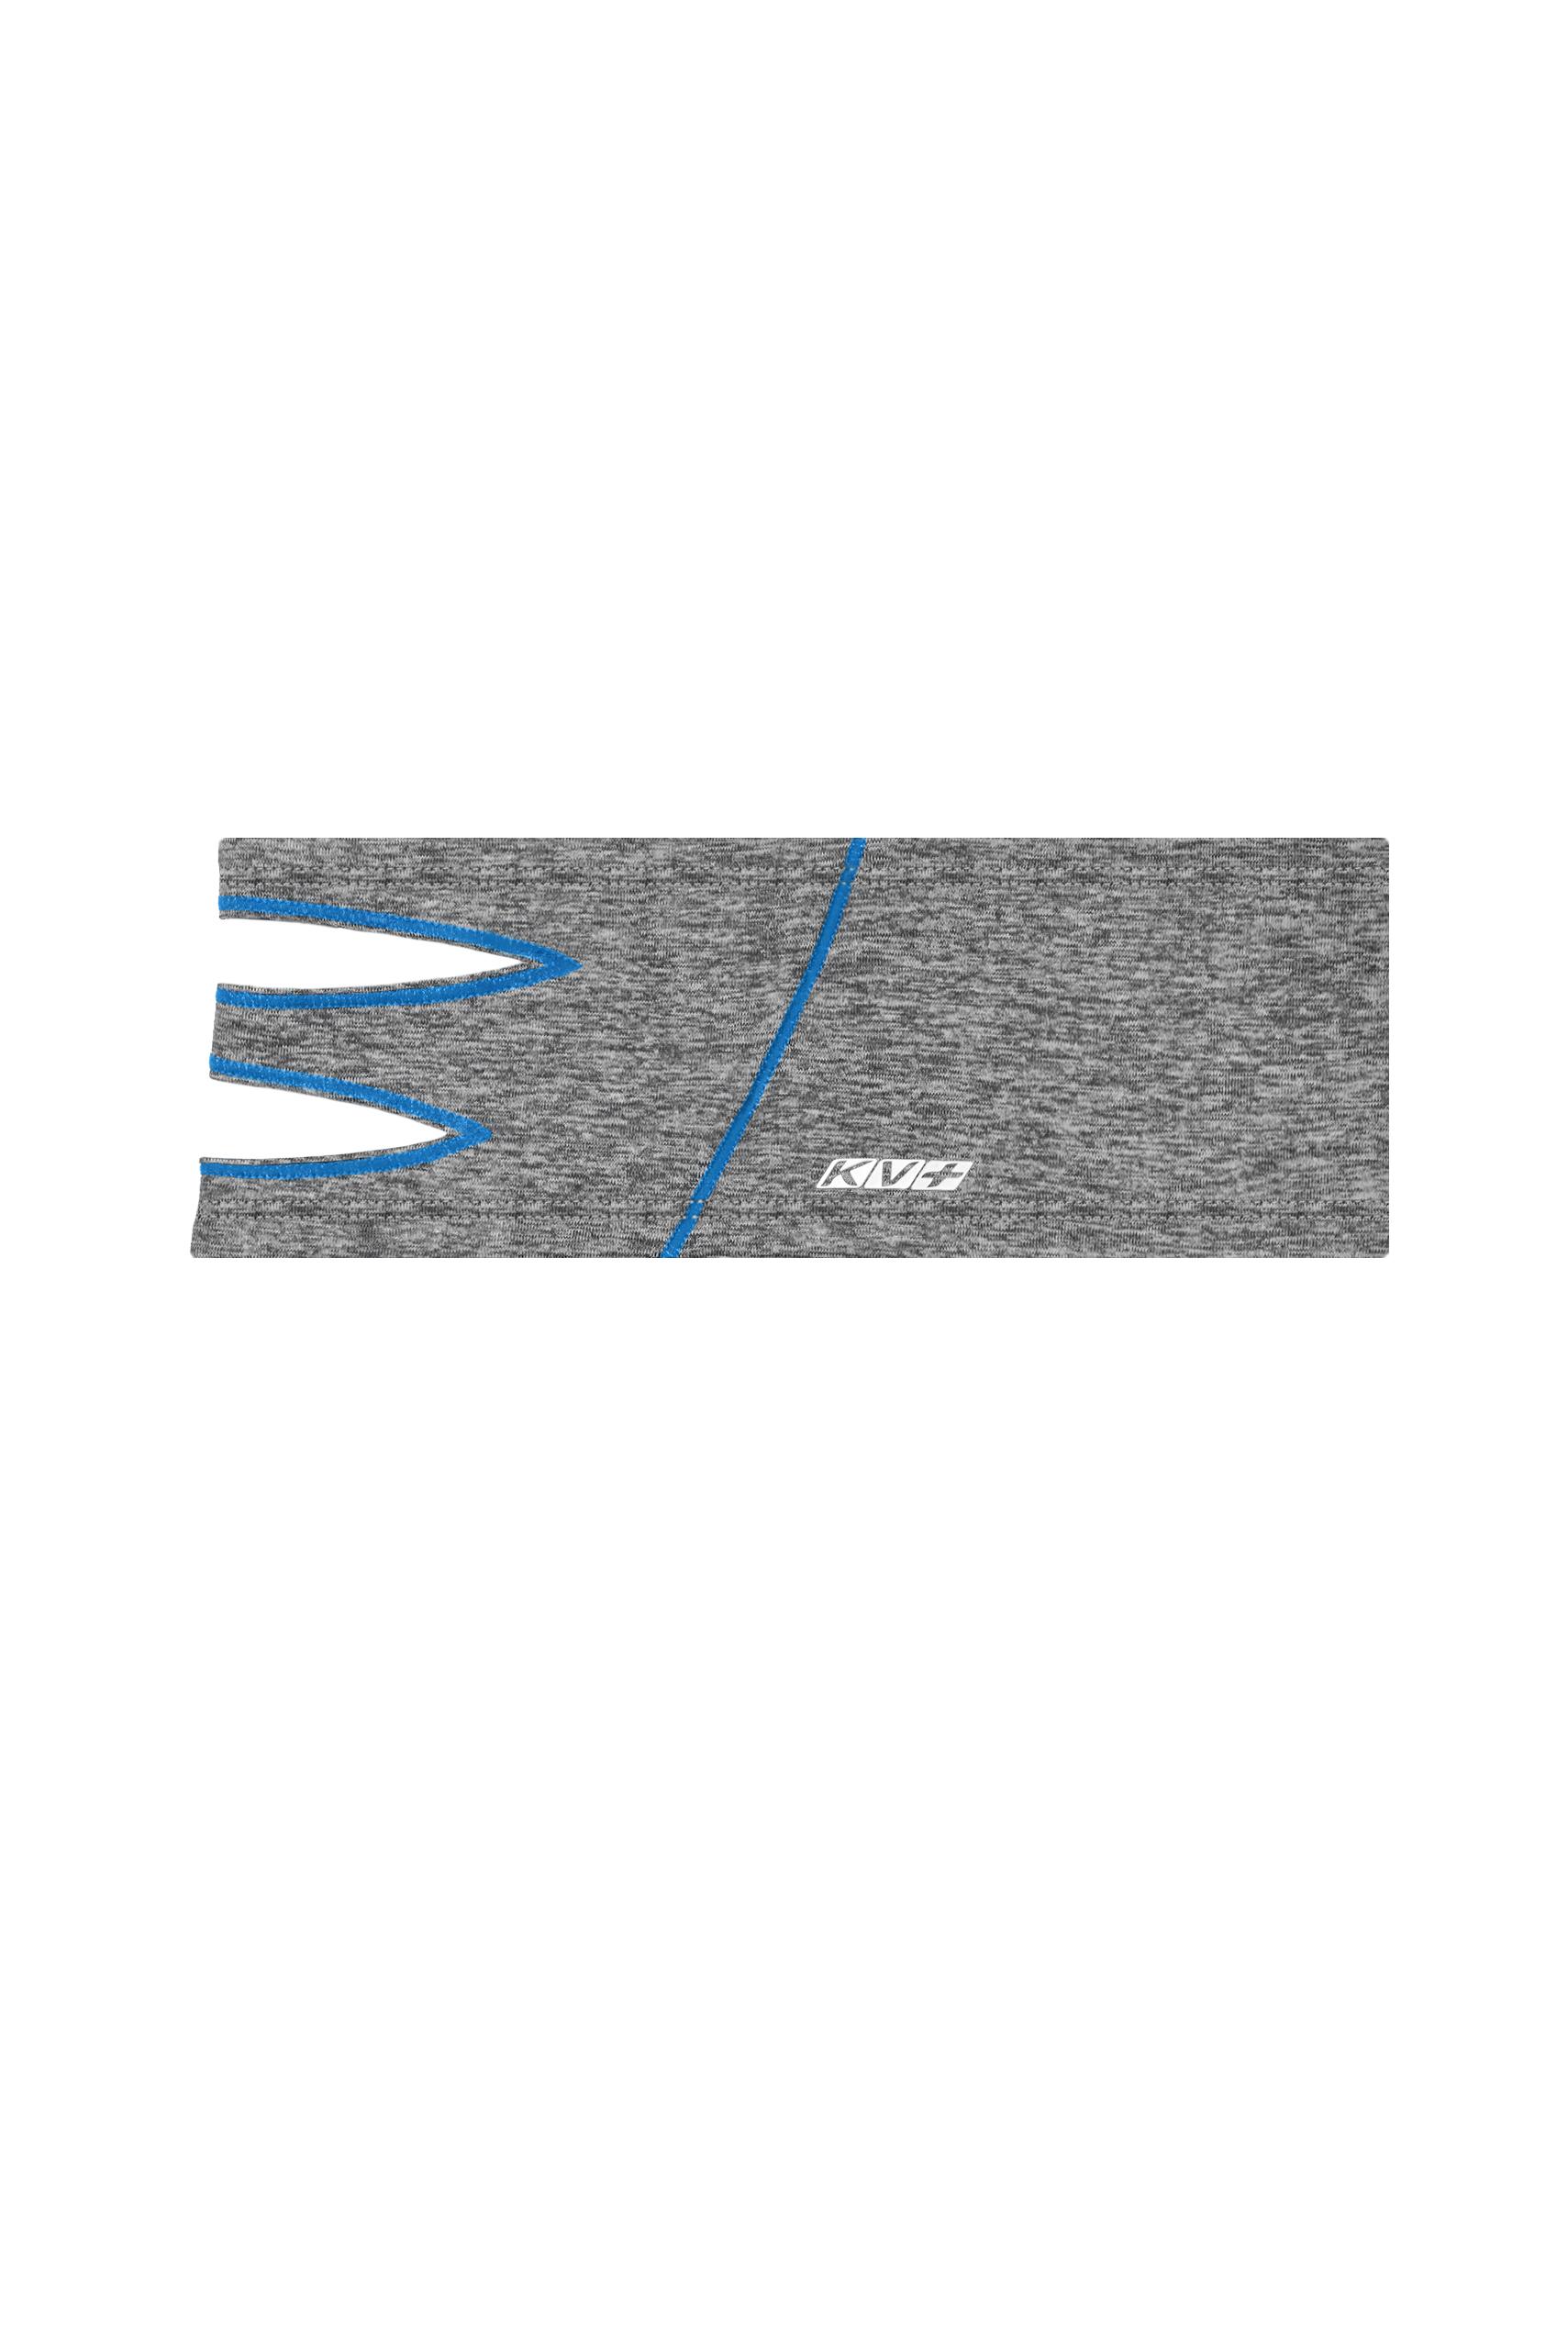 FOX HEADBAND  (grey/blue)